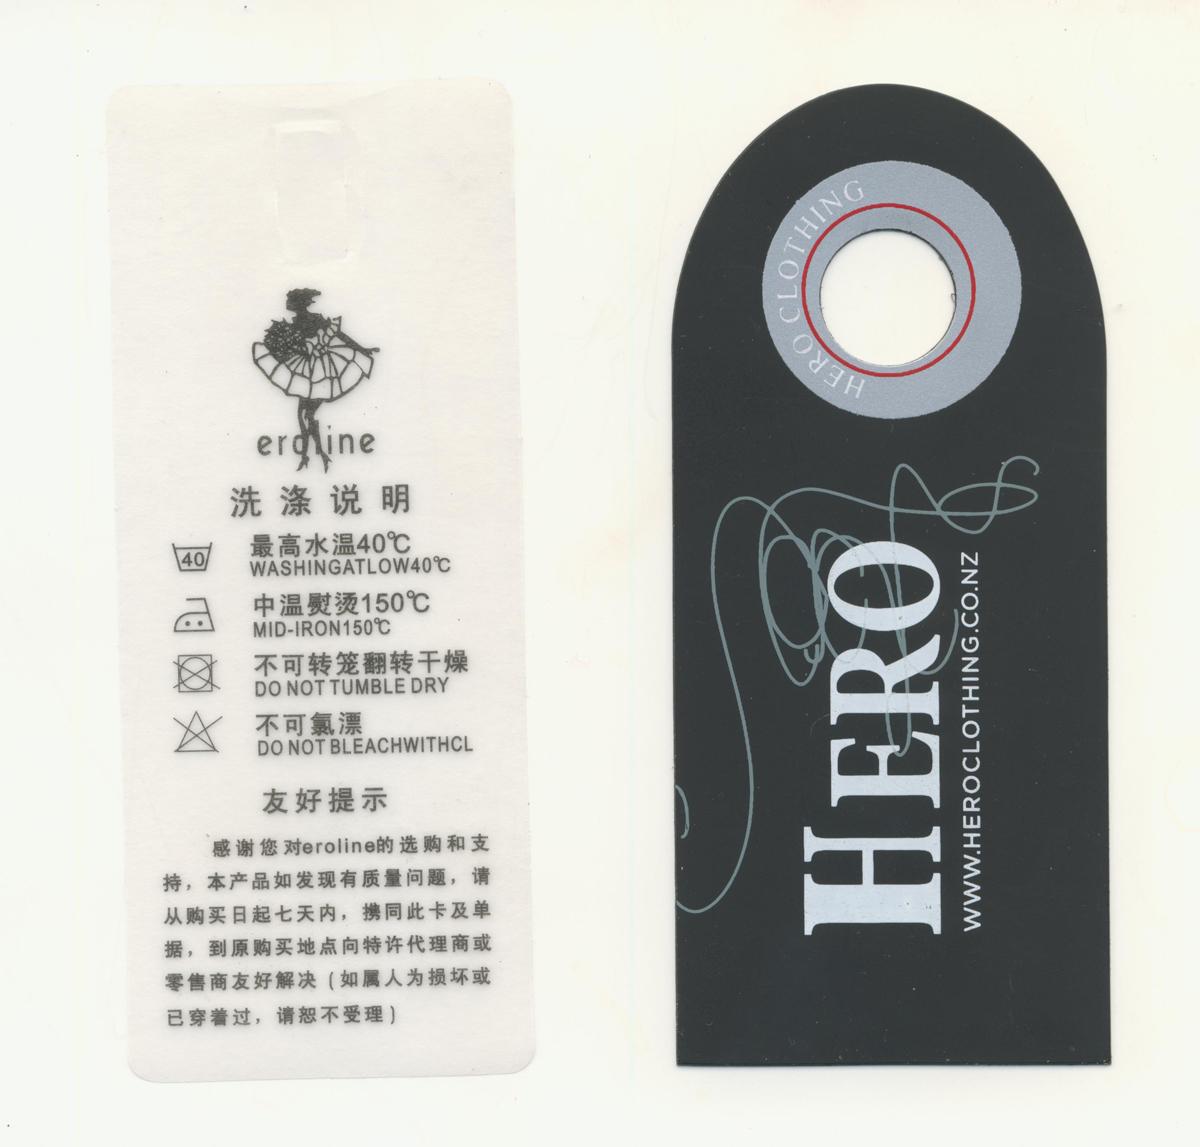 Custom Printed Hangtags on Unique Materials